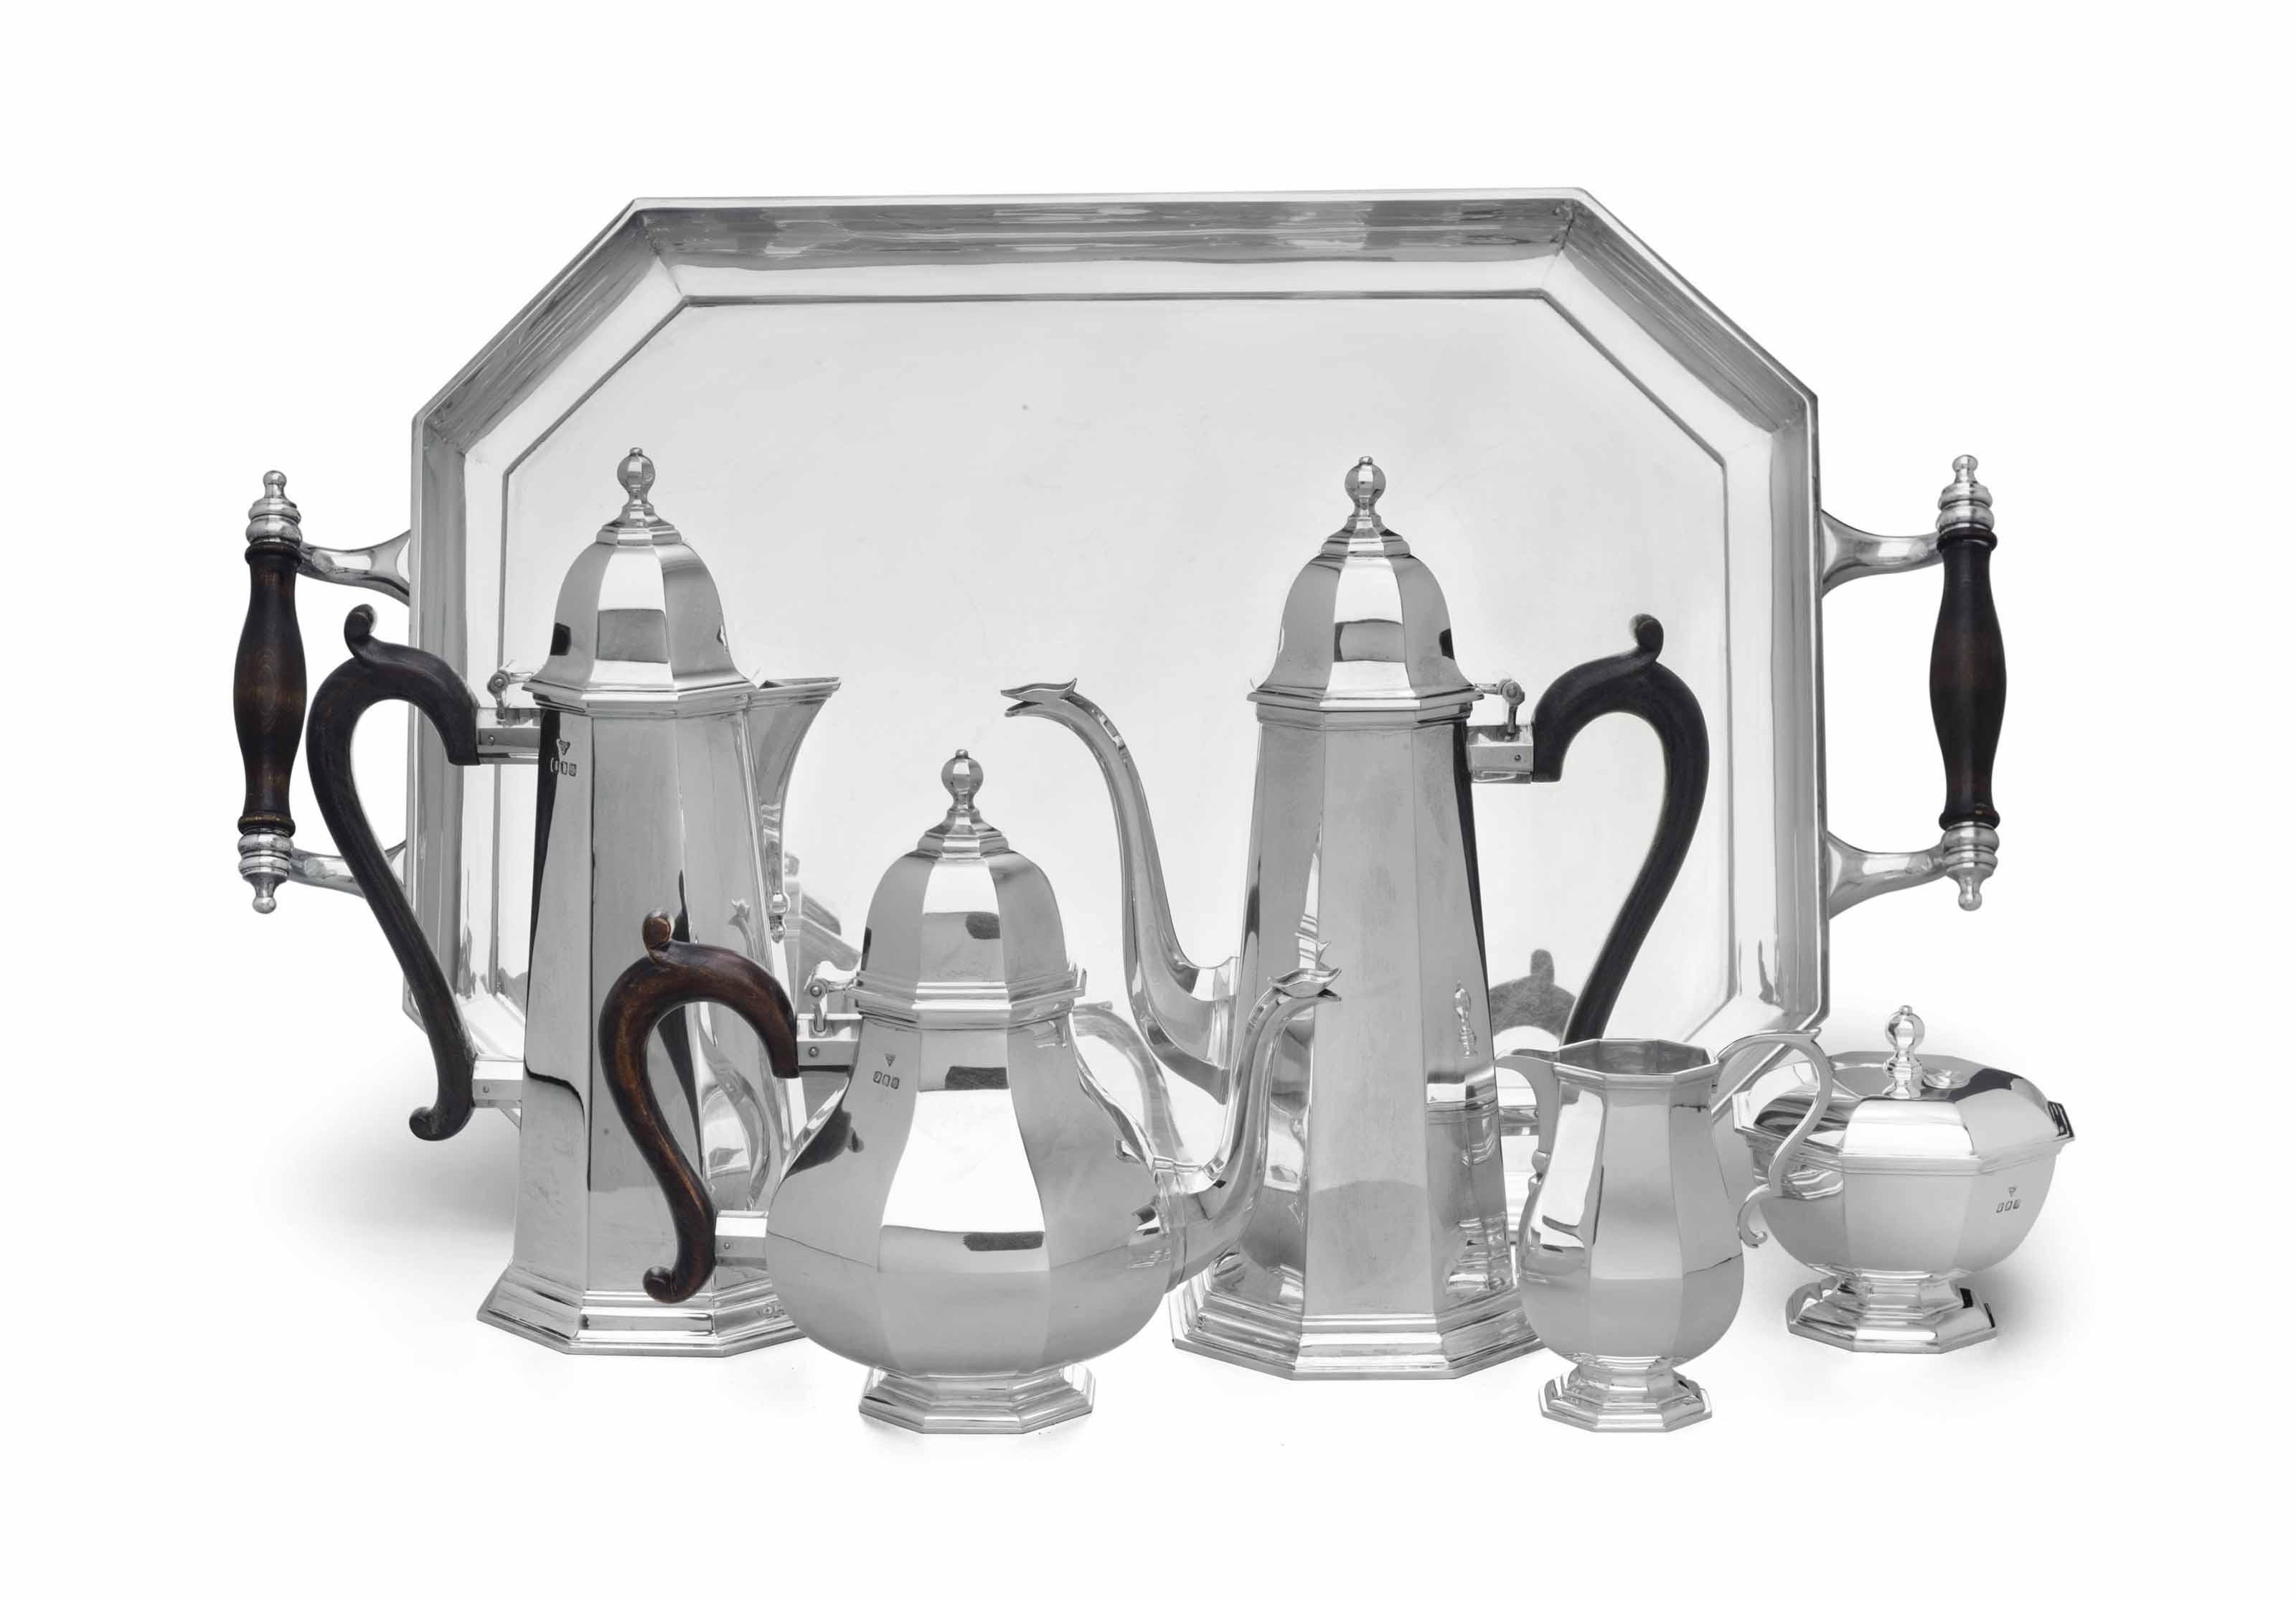 AN ELIZABETH II BRITANNIA STANDARD SILVER FIVE-PIECE TEA AND COFFEE SERVICE WITH TRAY